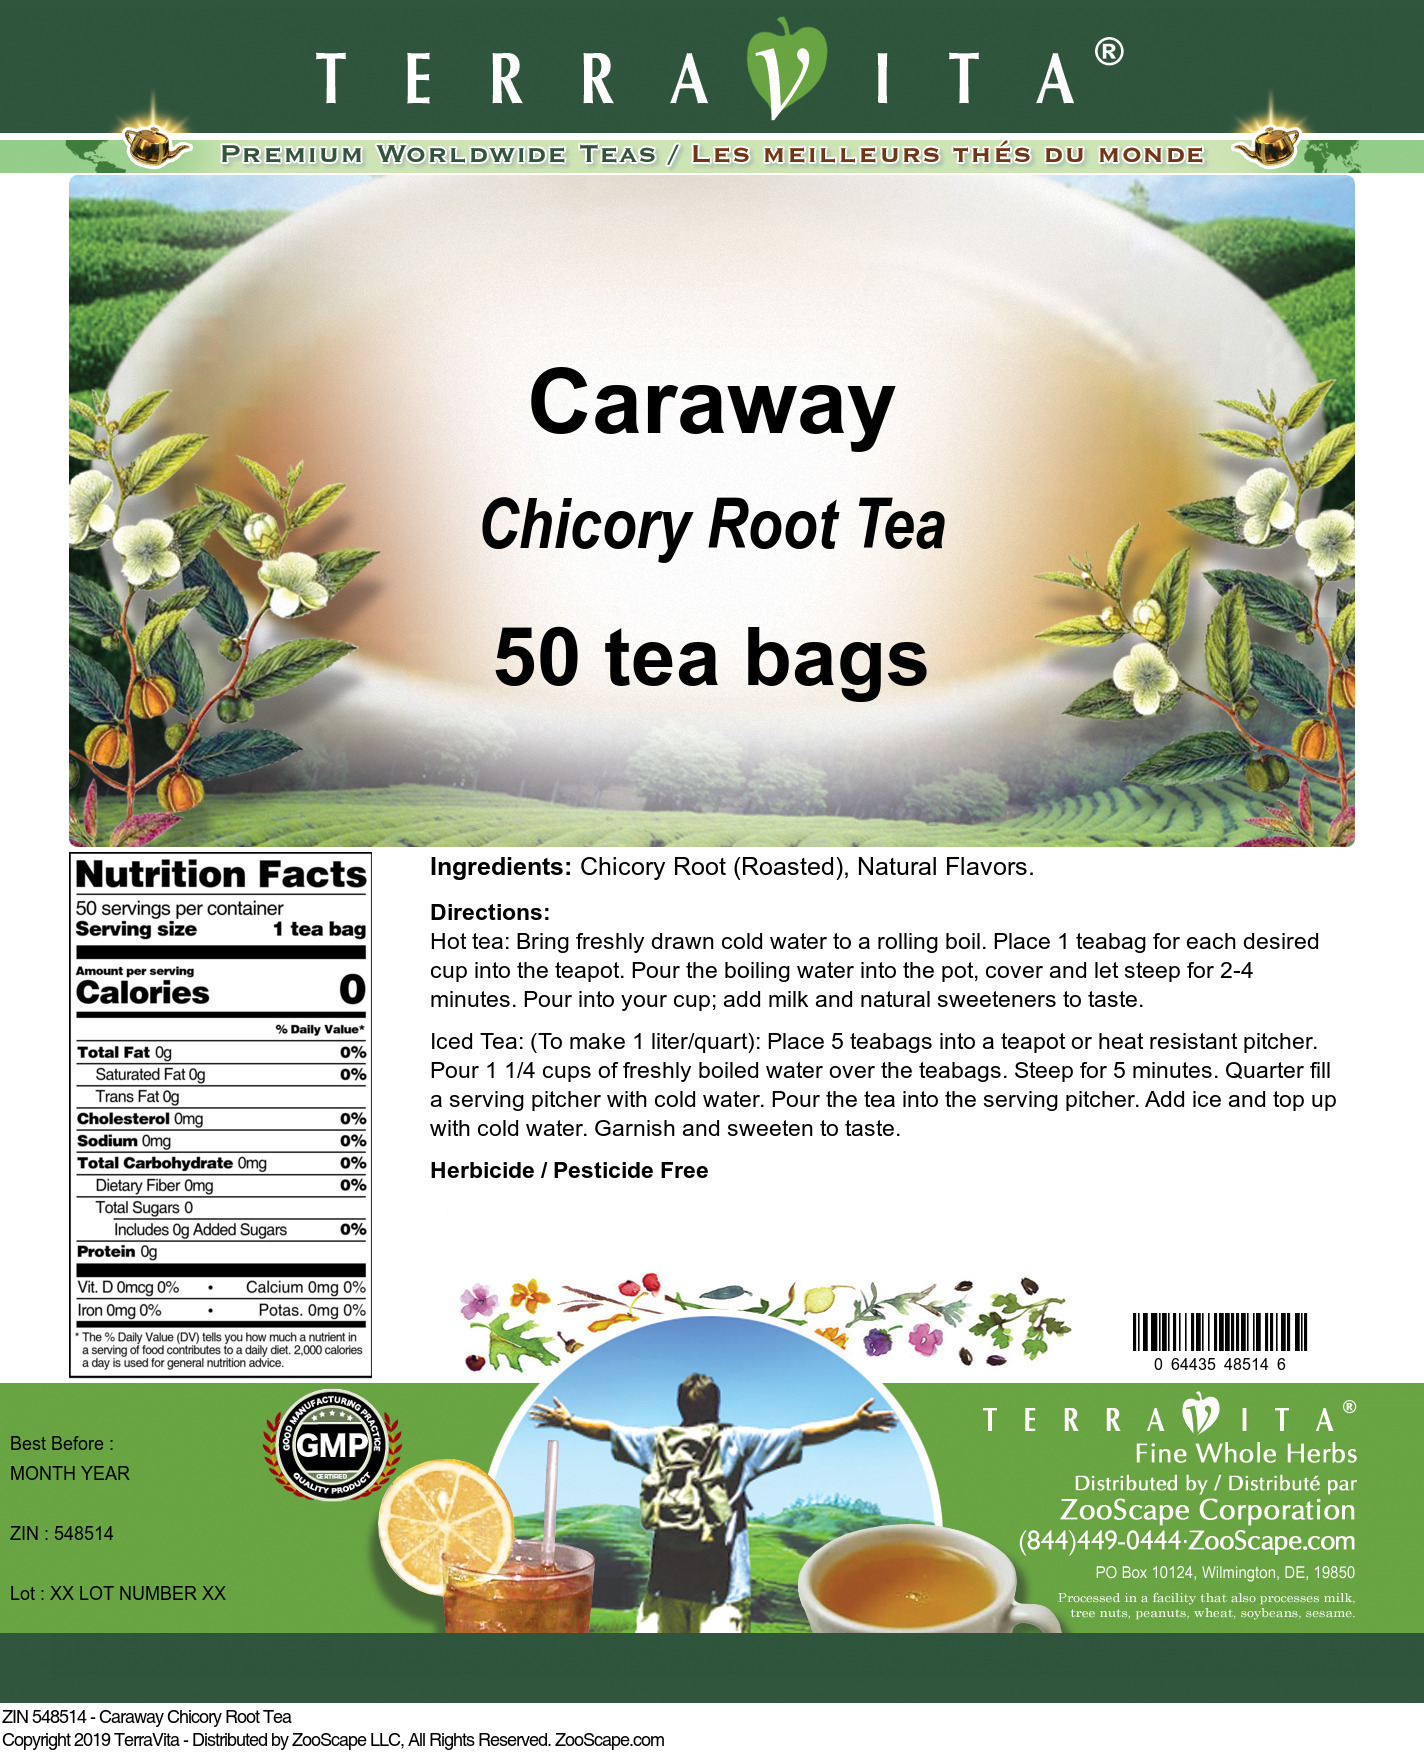 Caraway Chicory Root